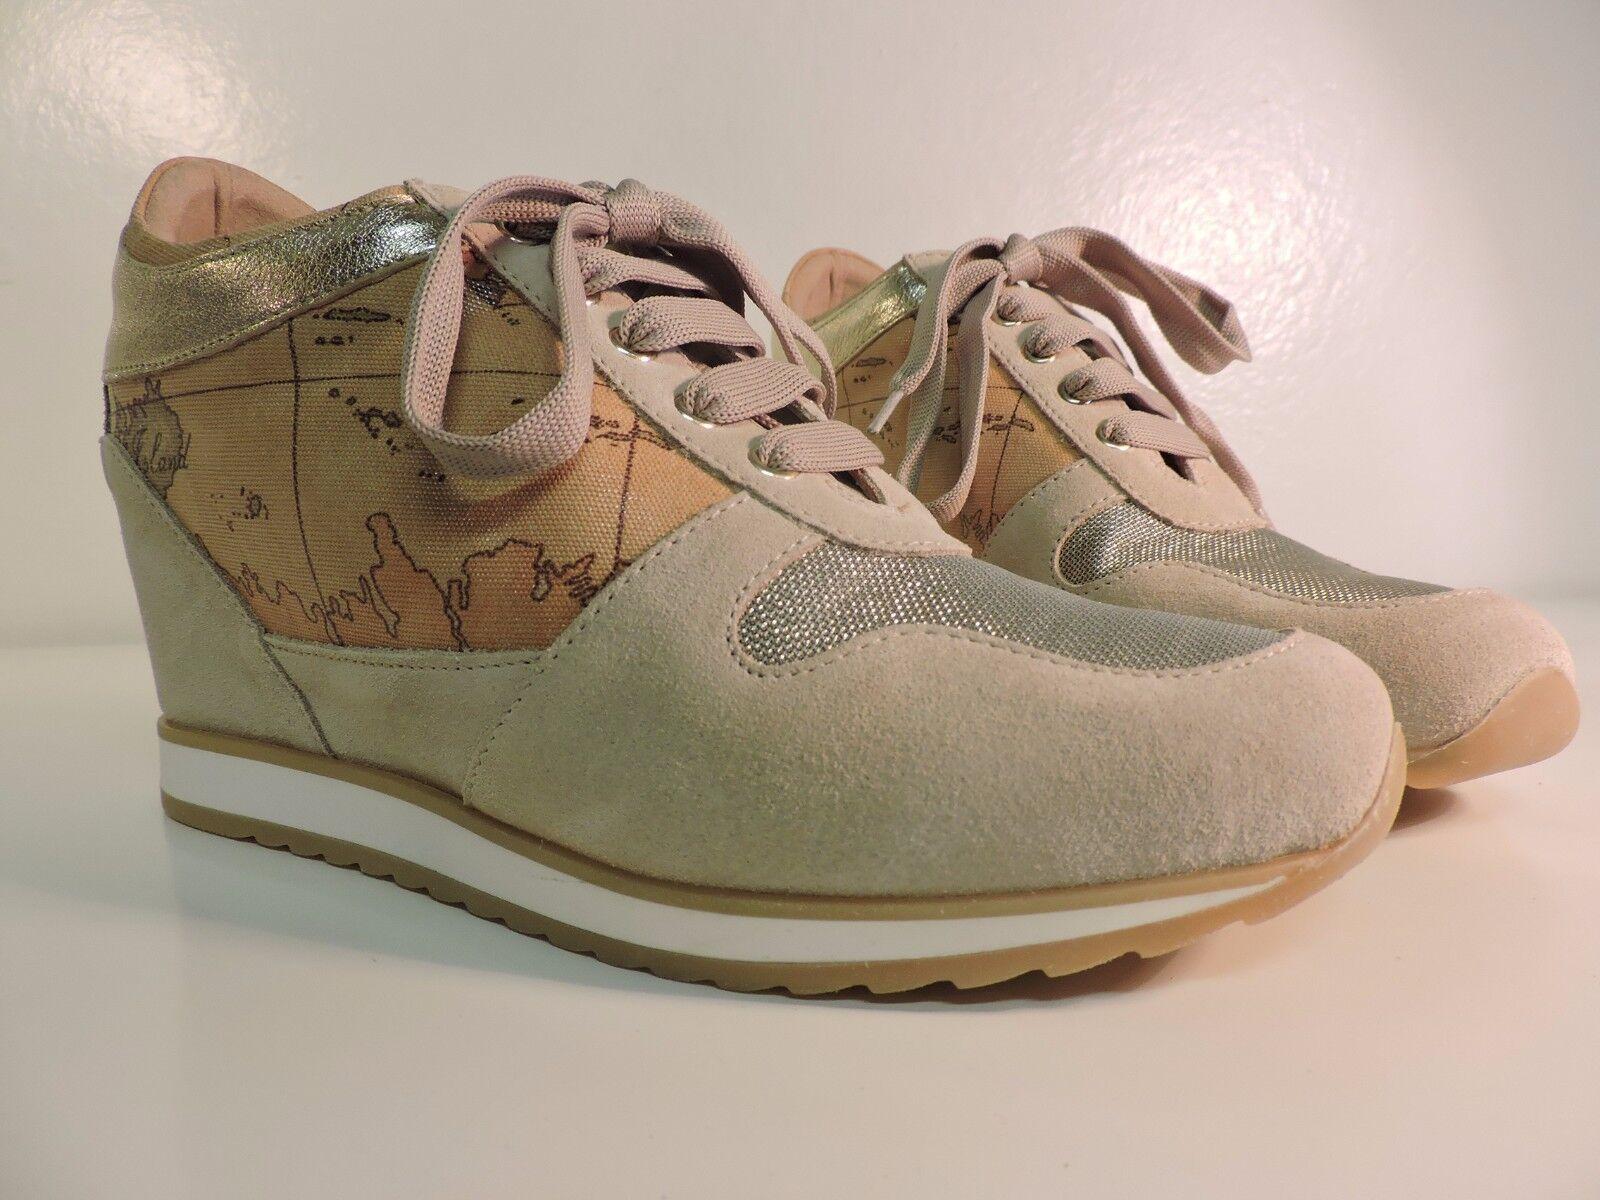 ALVIERO MARTINI 1°CLASSE Zapatos mujer SNEAKERS TAGLIE ZEPPA ALTE Oro VARIE TAGLIE SNEAKERS d26989